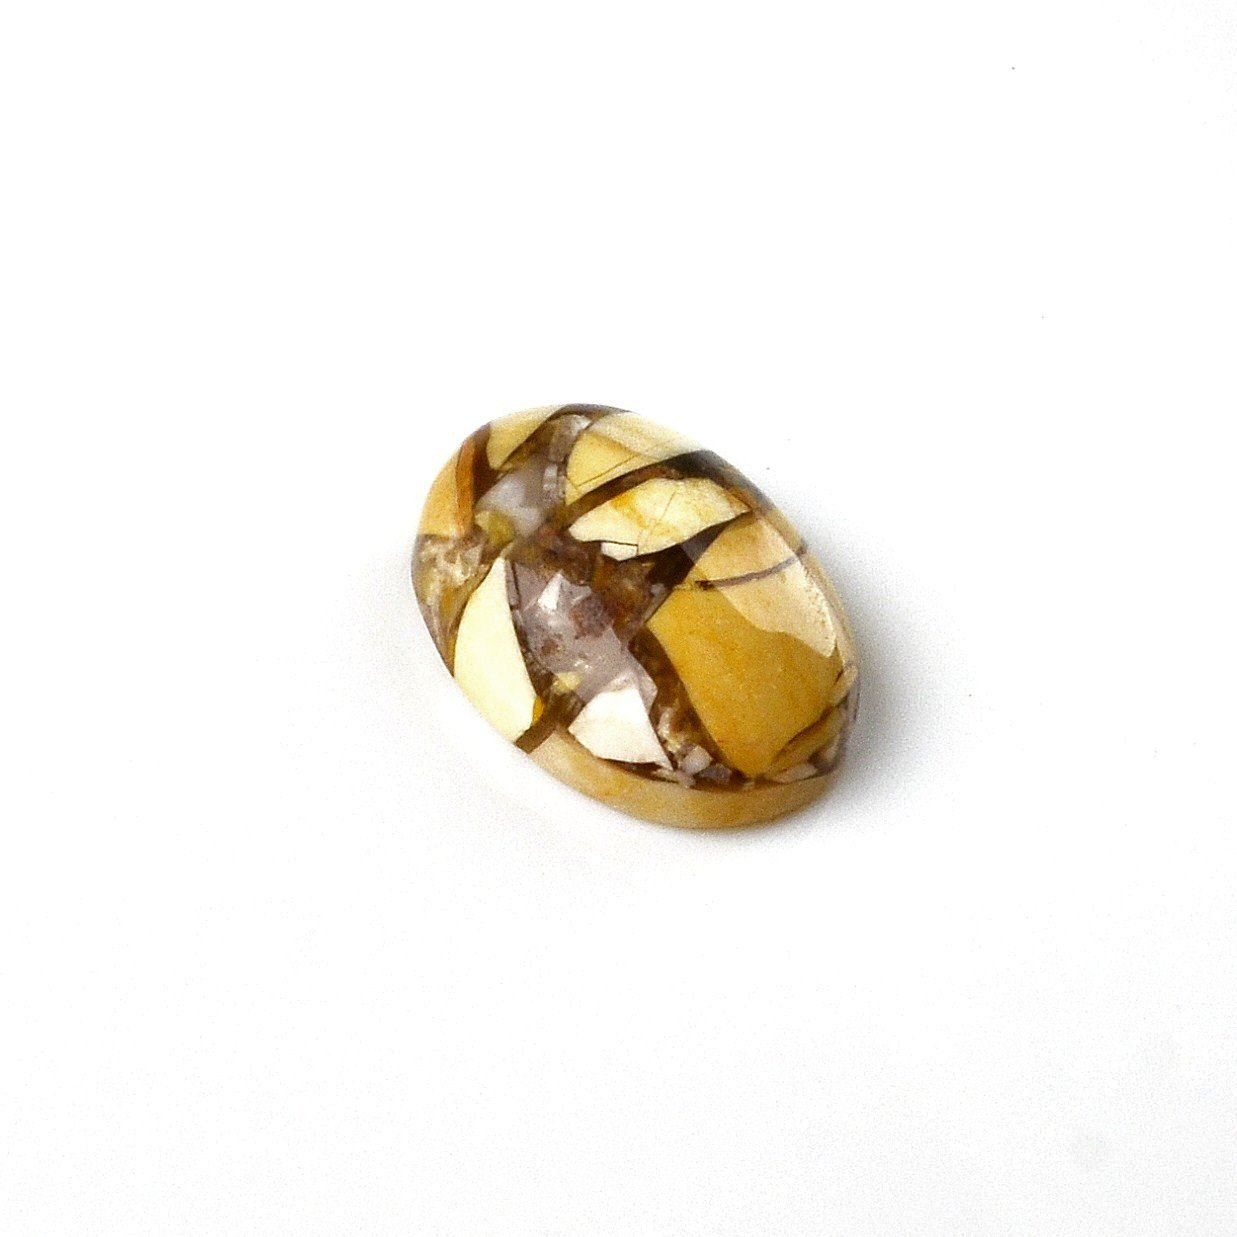 Quality Handcrafts Guaranteed Stone Cabochon Lapel Pin